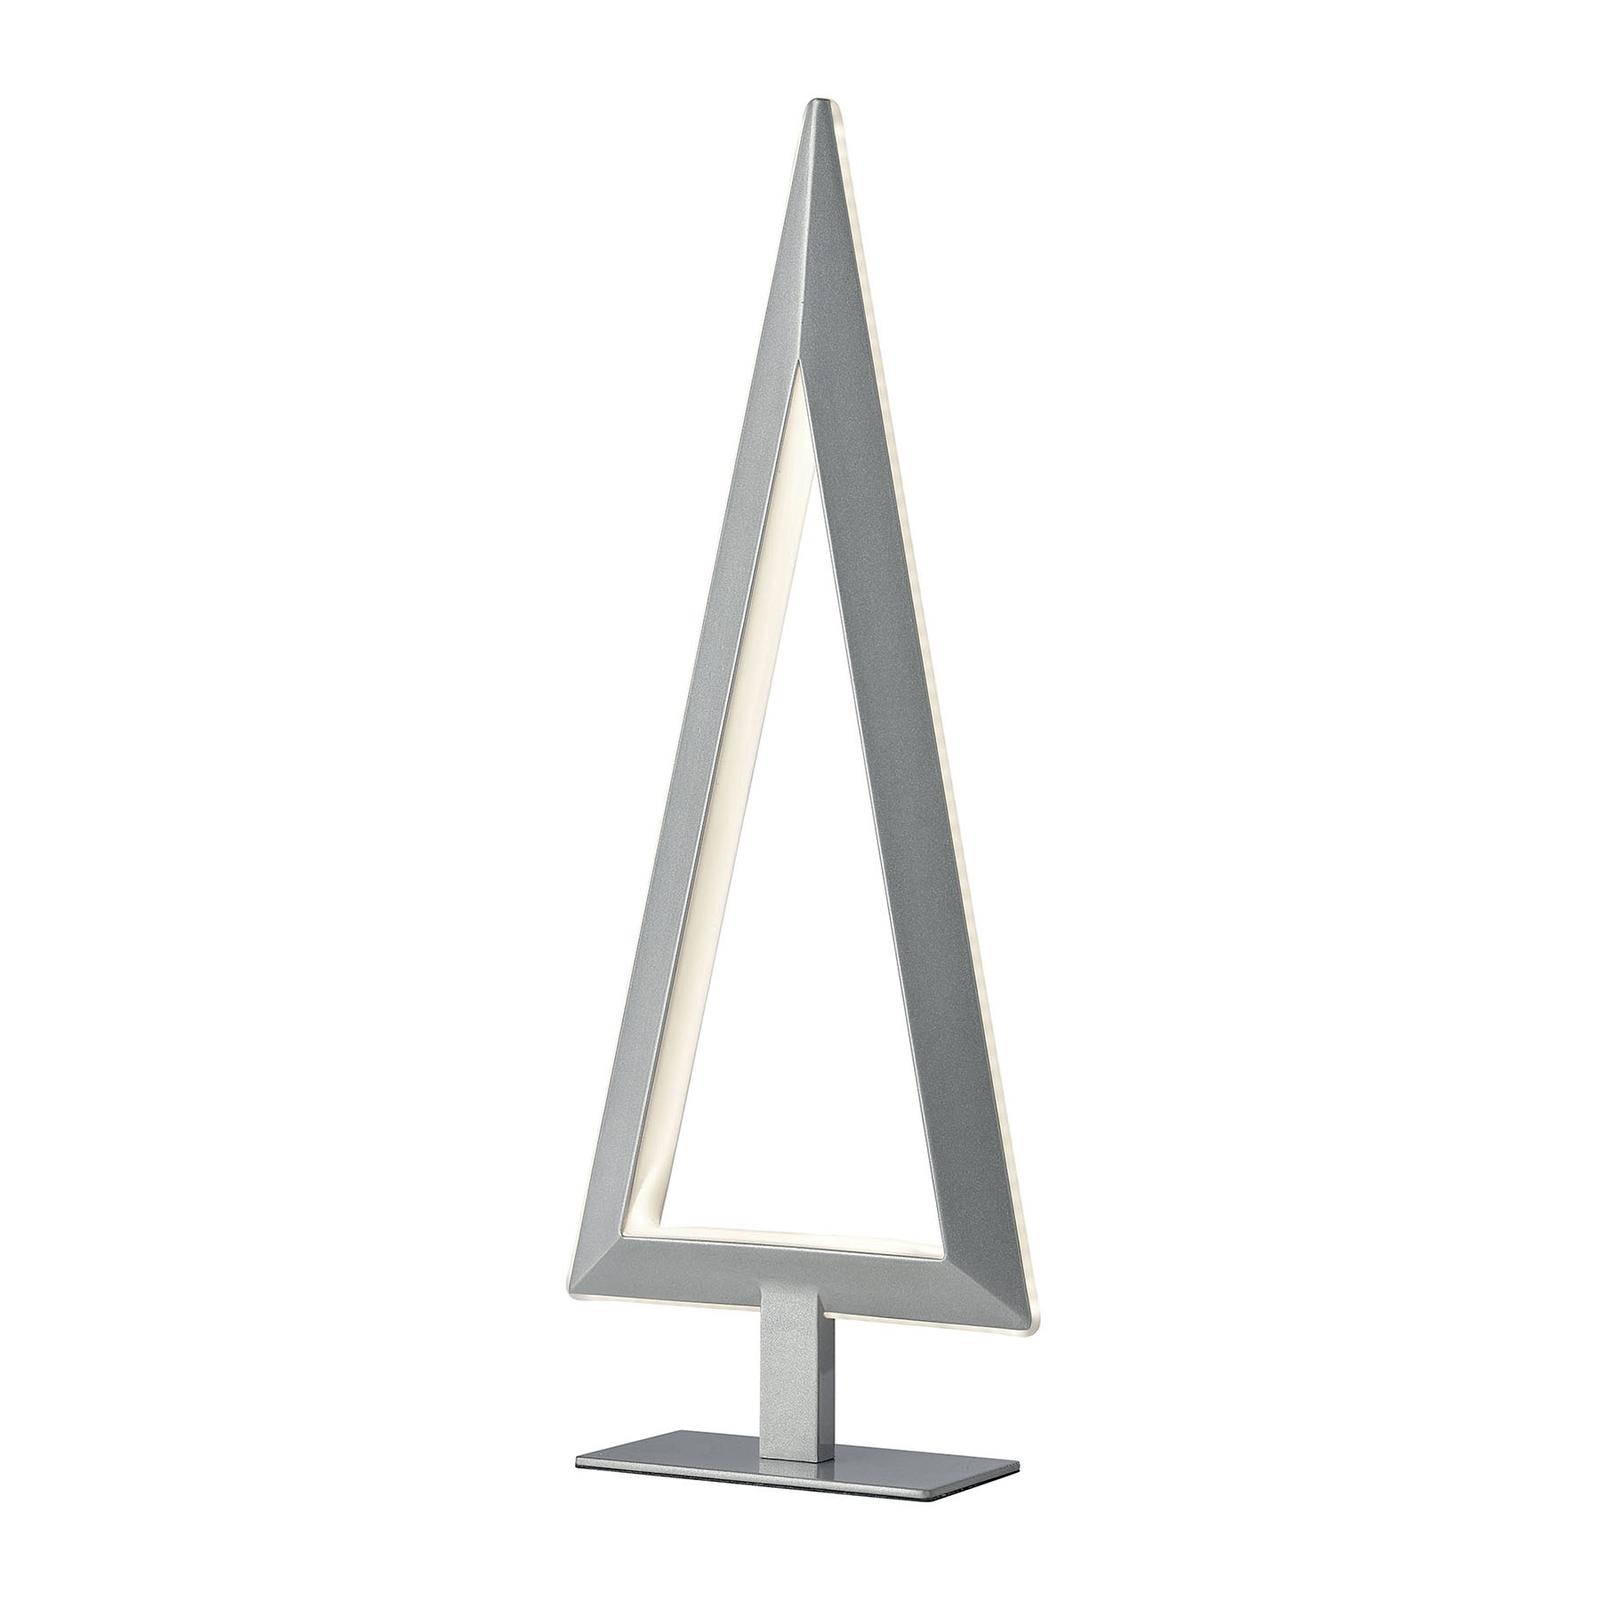 LED sfeerlamp boom, hoogte 53 cm